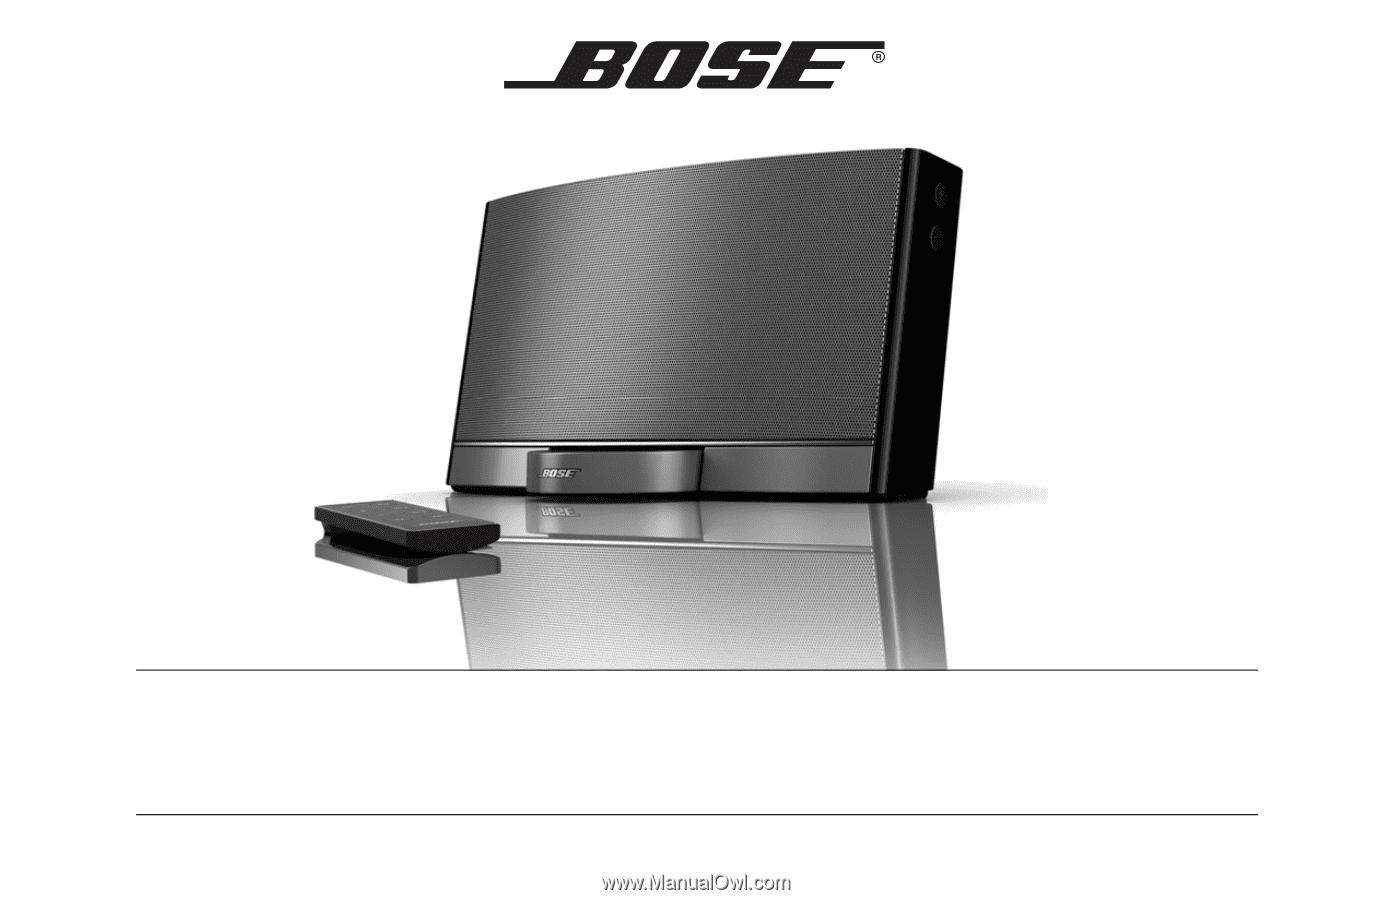 bose sounddock digital music system manual